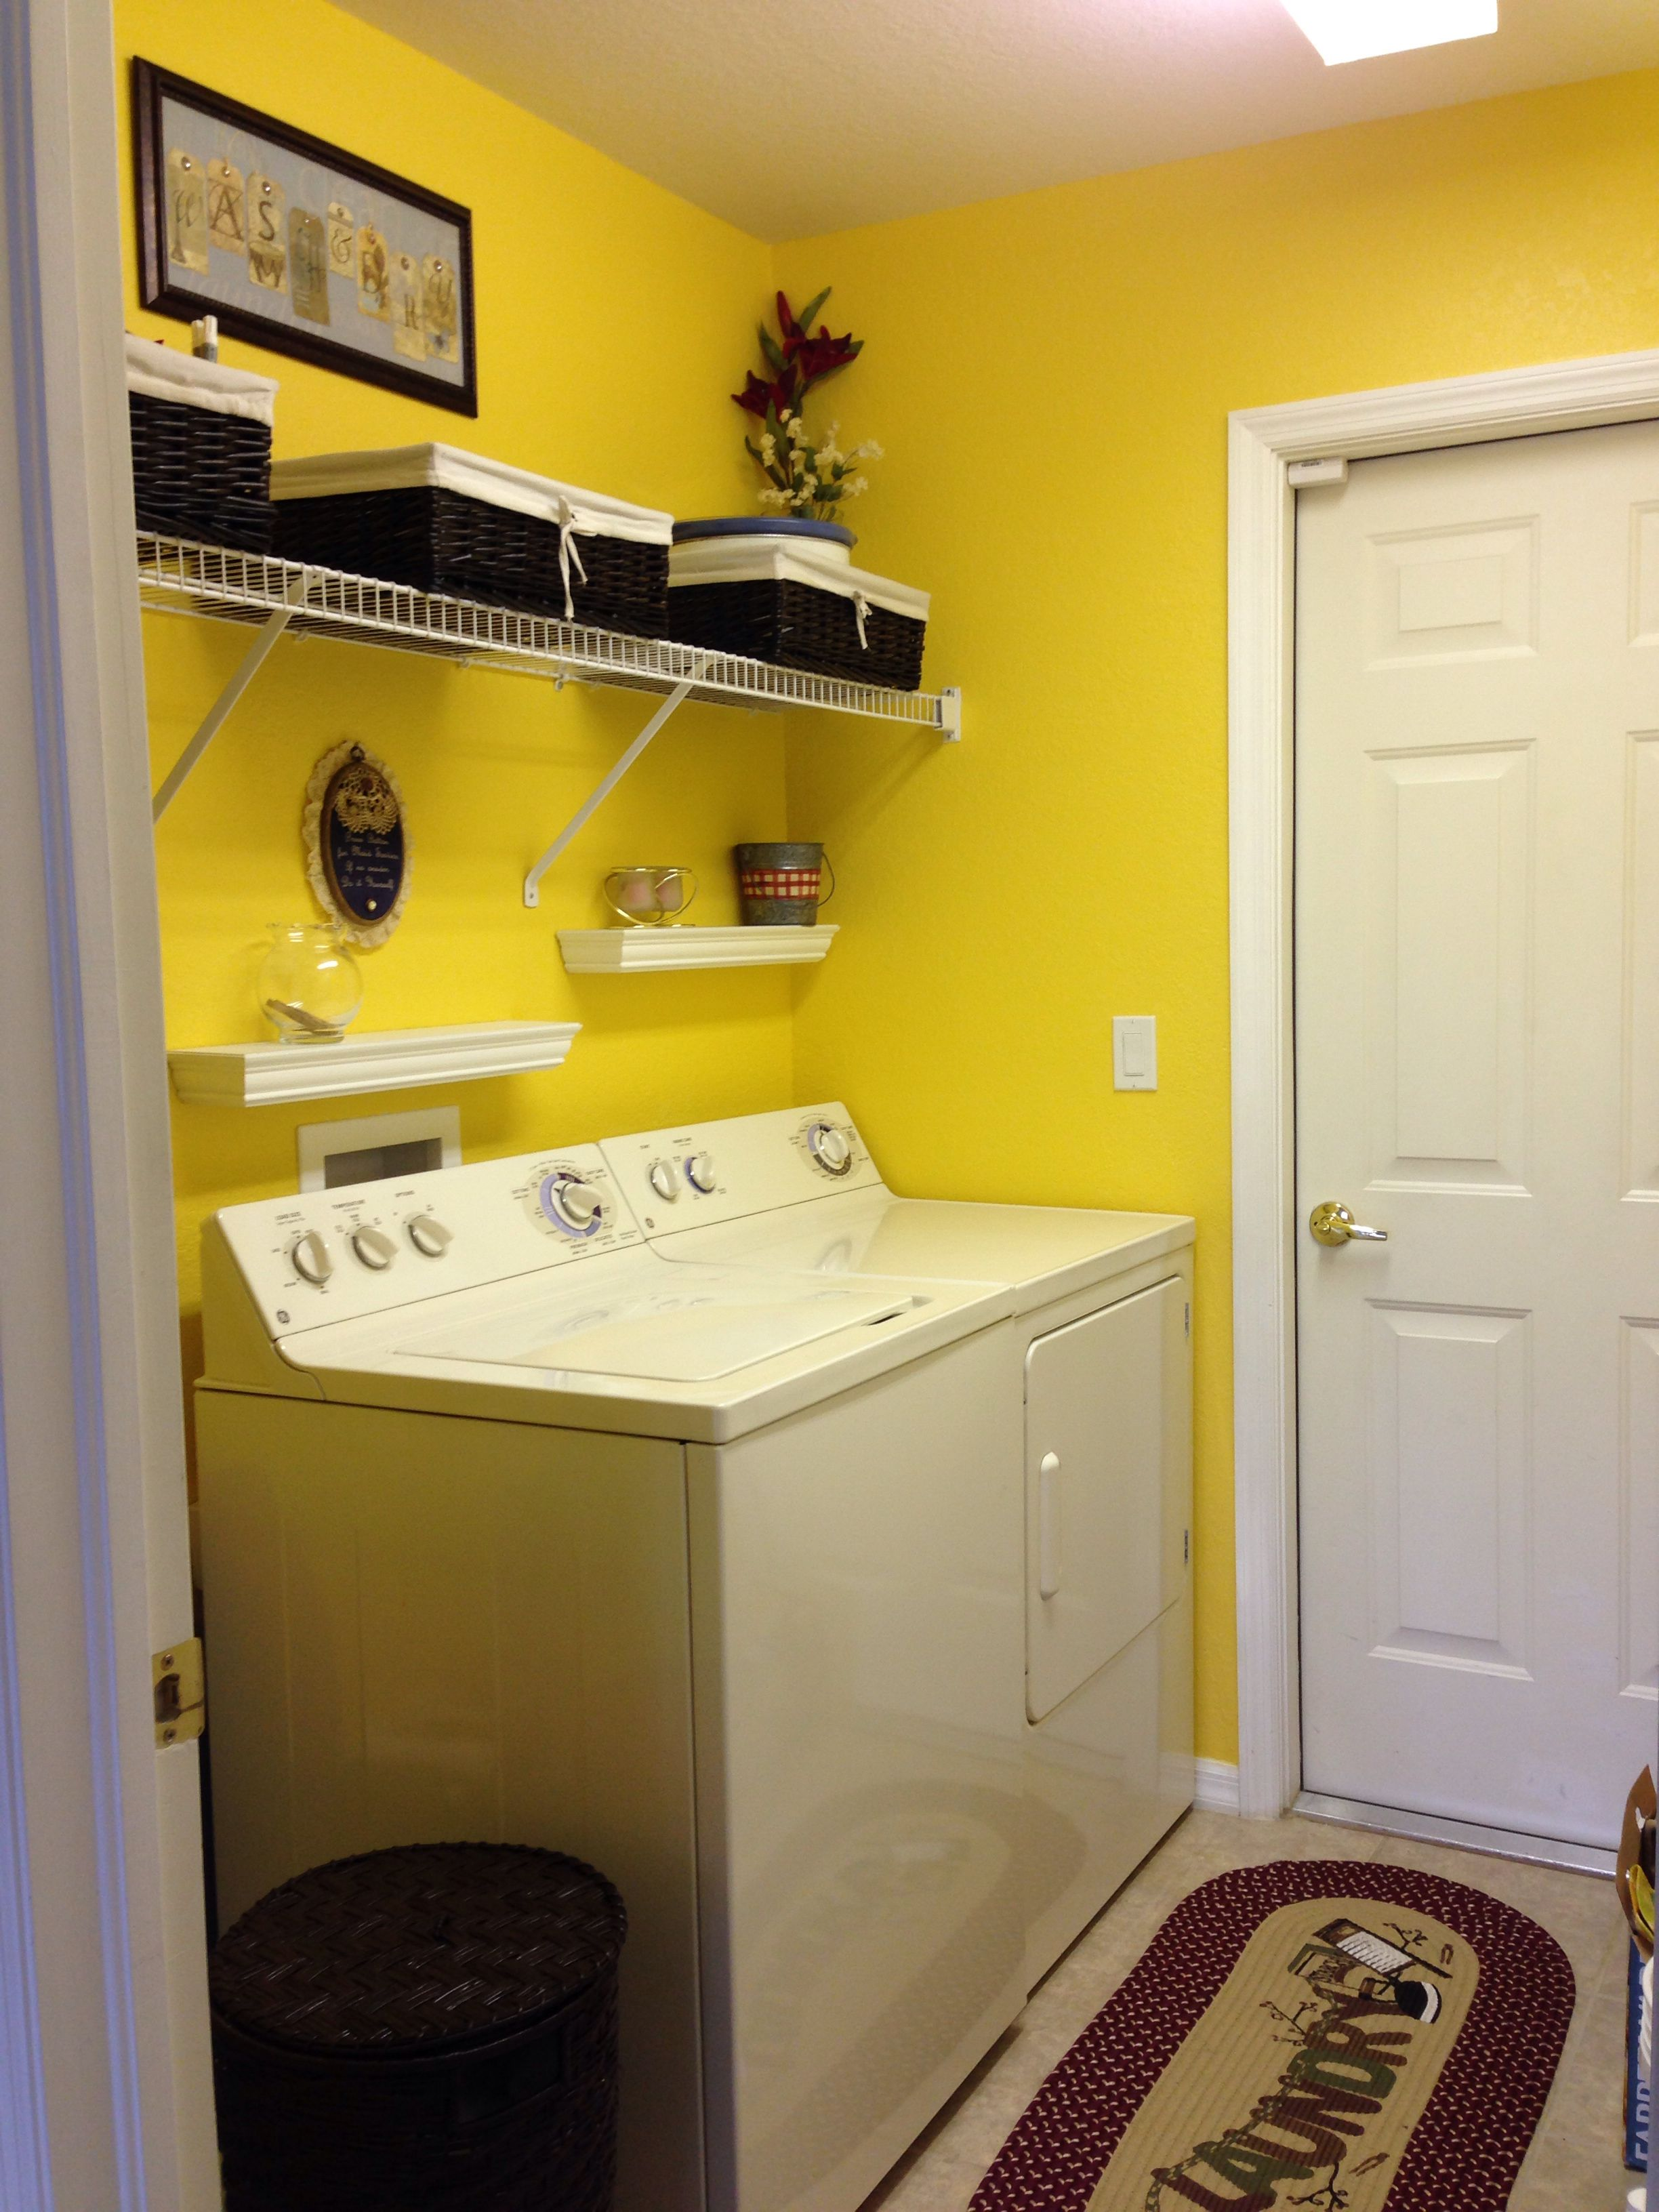 Pin By Linda Galuska On Laundry Room Yellow Laundry Rooms Laundry Room Decor Laundry Room Colors